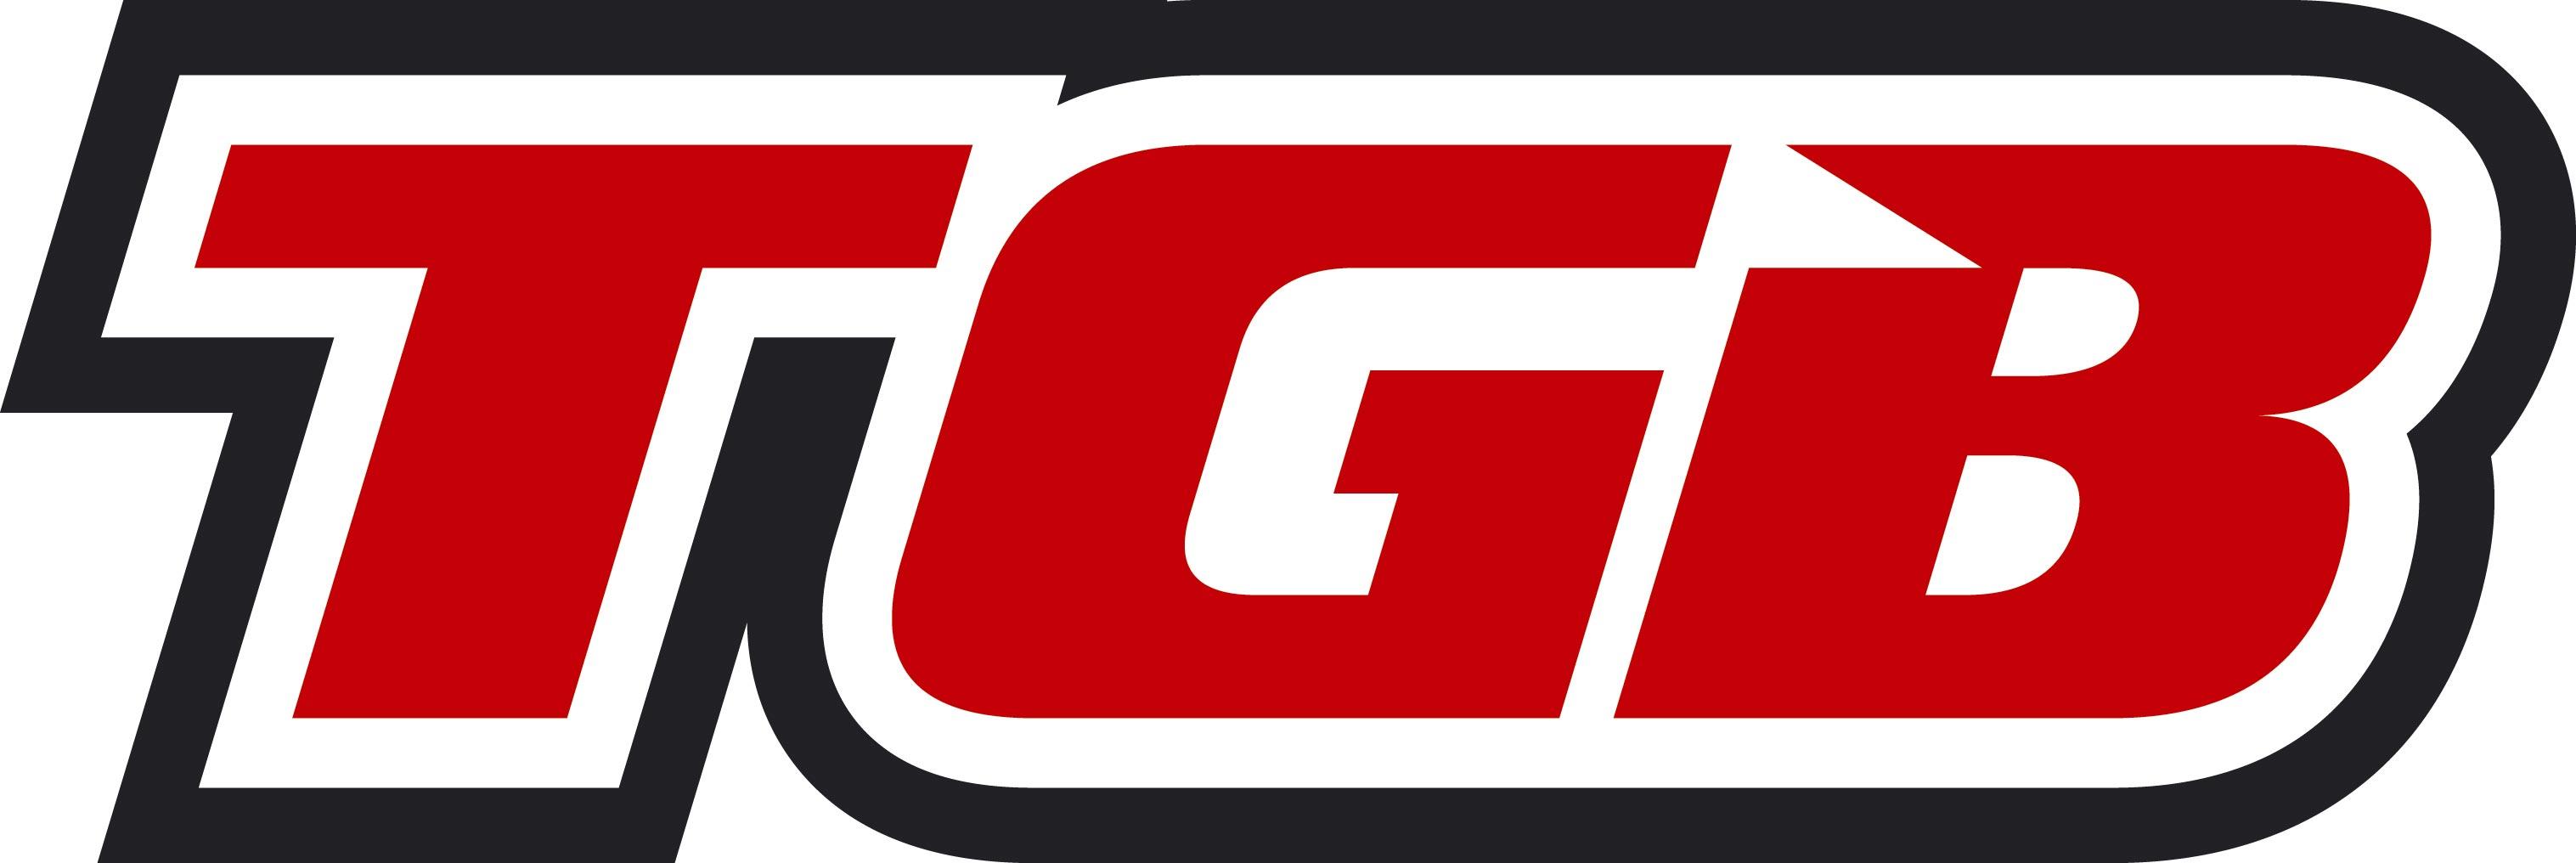 TGB Logo photo - 1